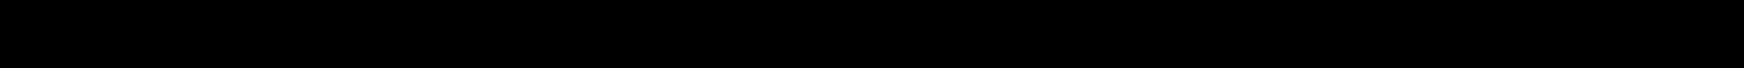 Neutra2DispGr-Thin.otf